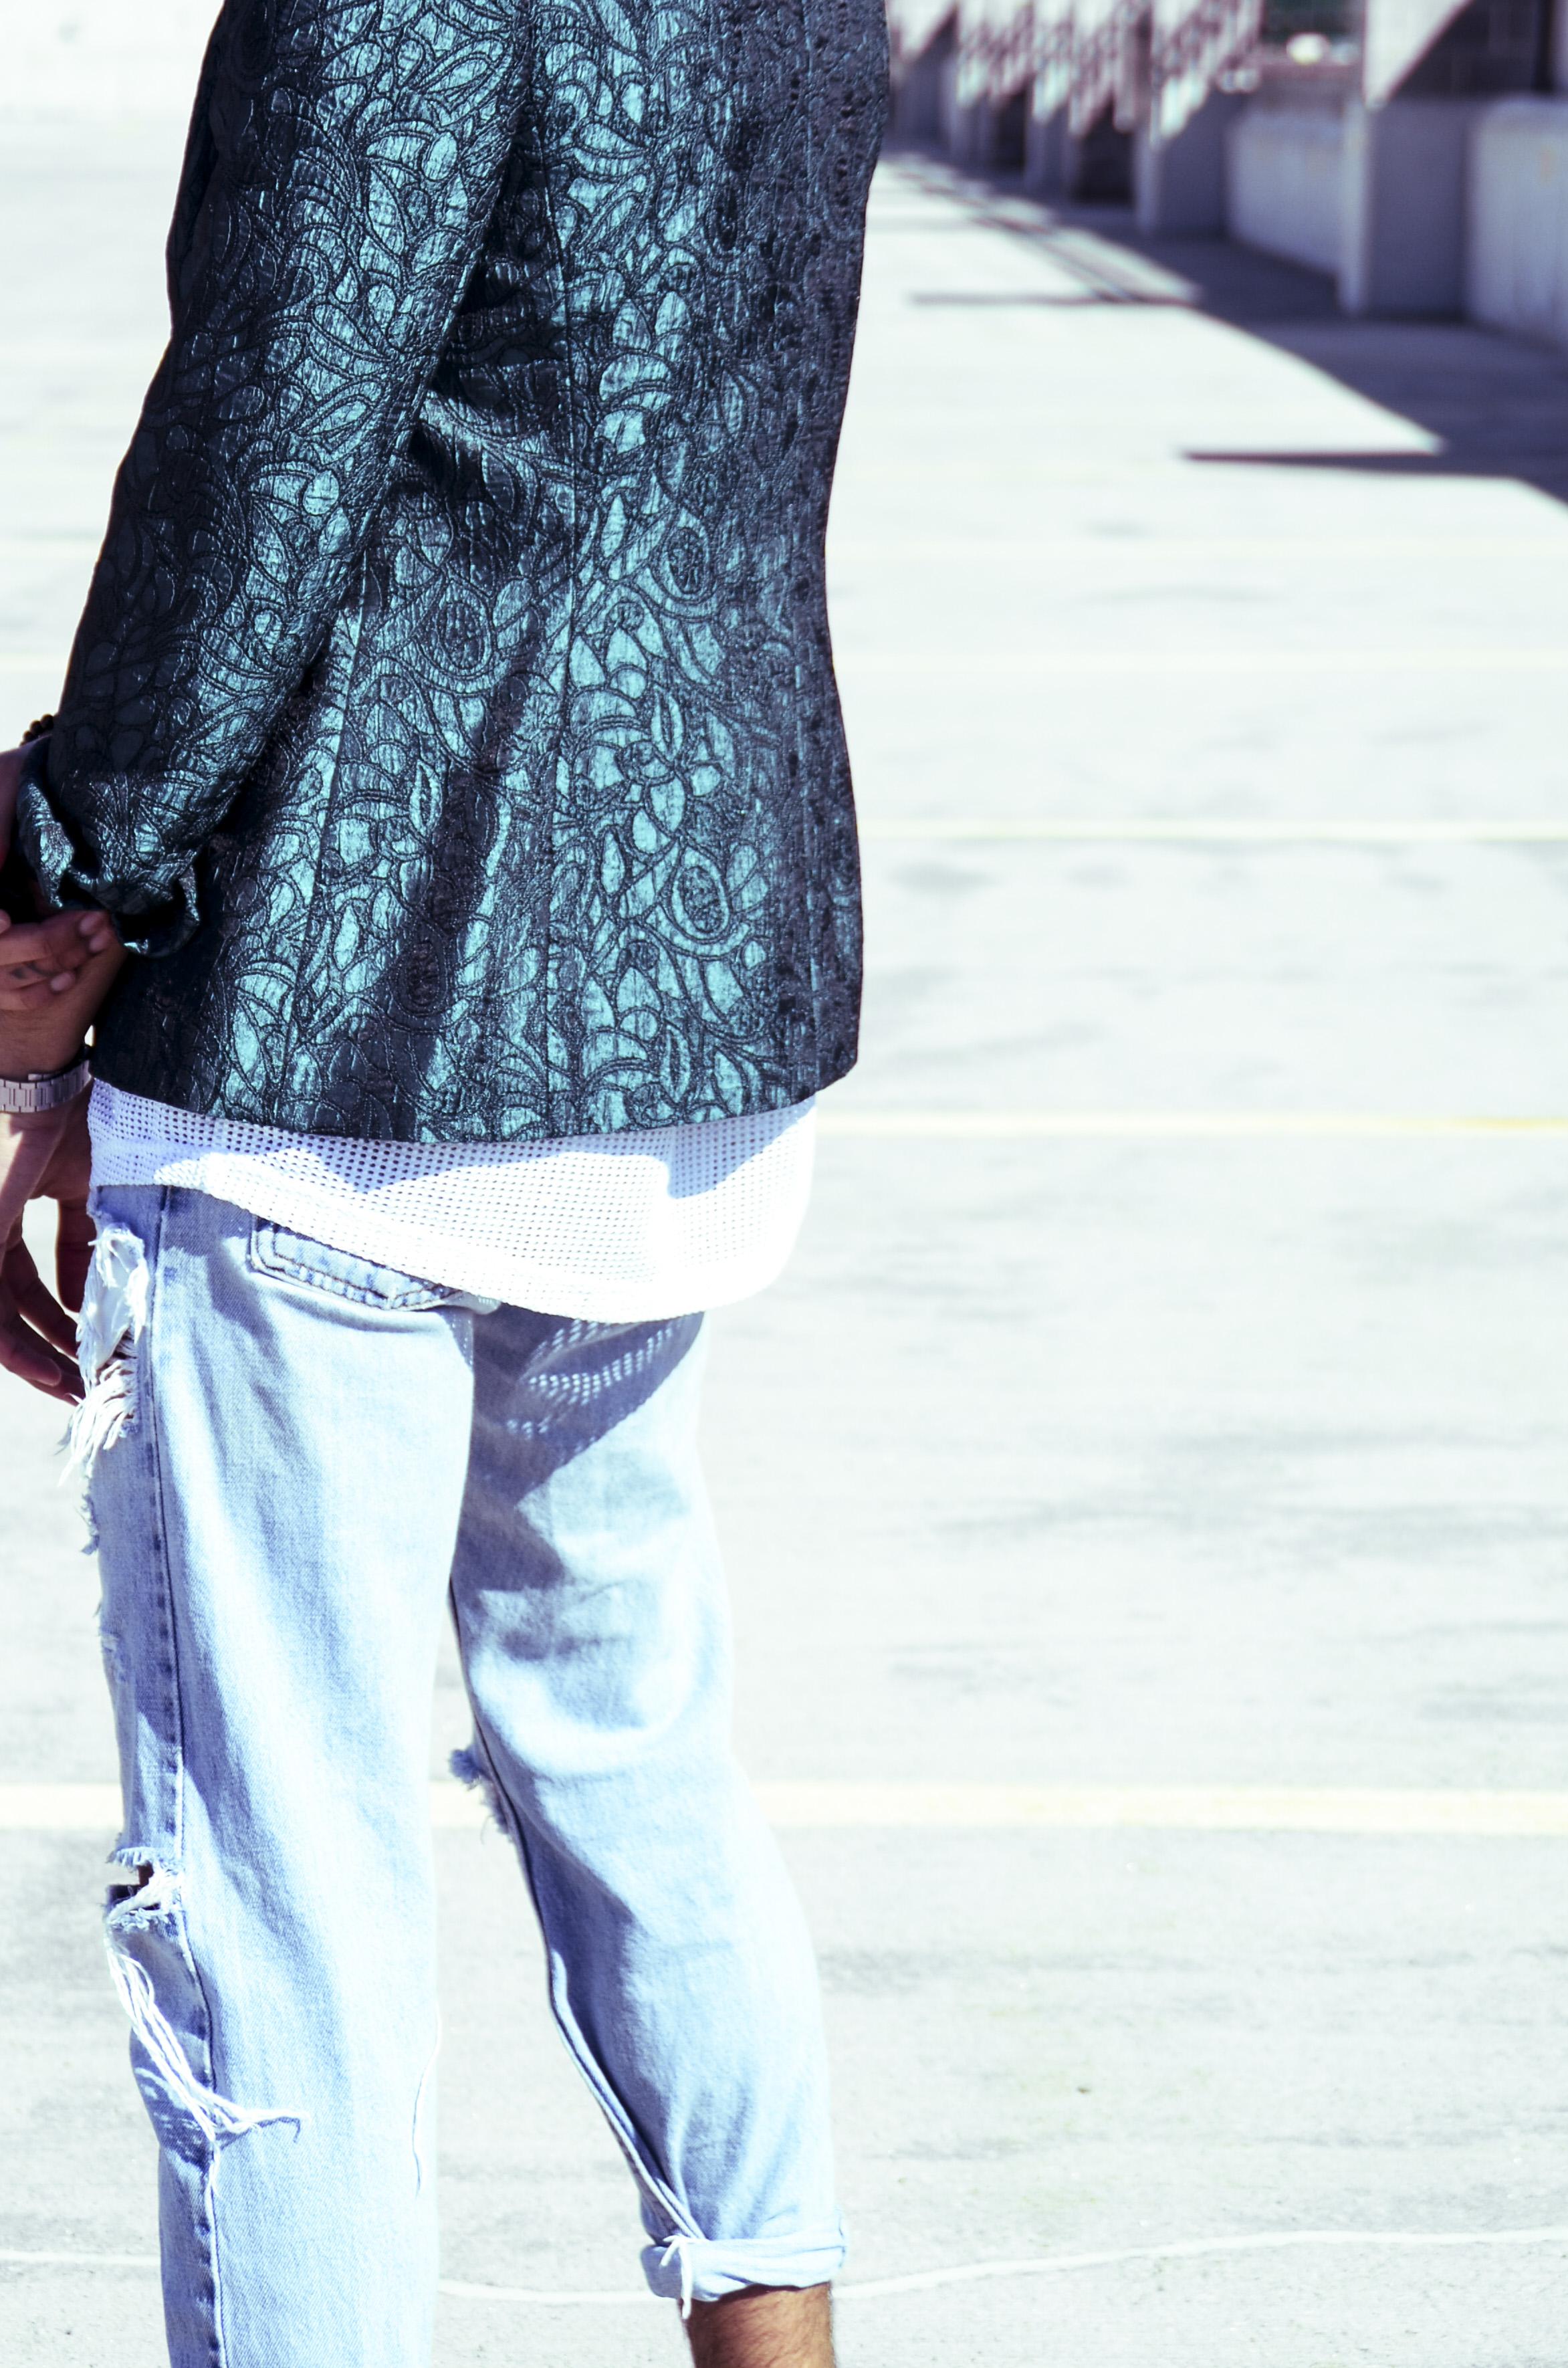 Blazer - Thrifted (Volunteers of America) | Mesh T- Shirt - ASOS ( asos.com ) | Jeans - Self Distressed Levis